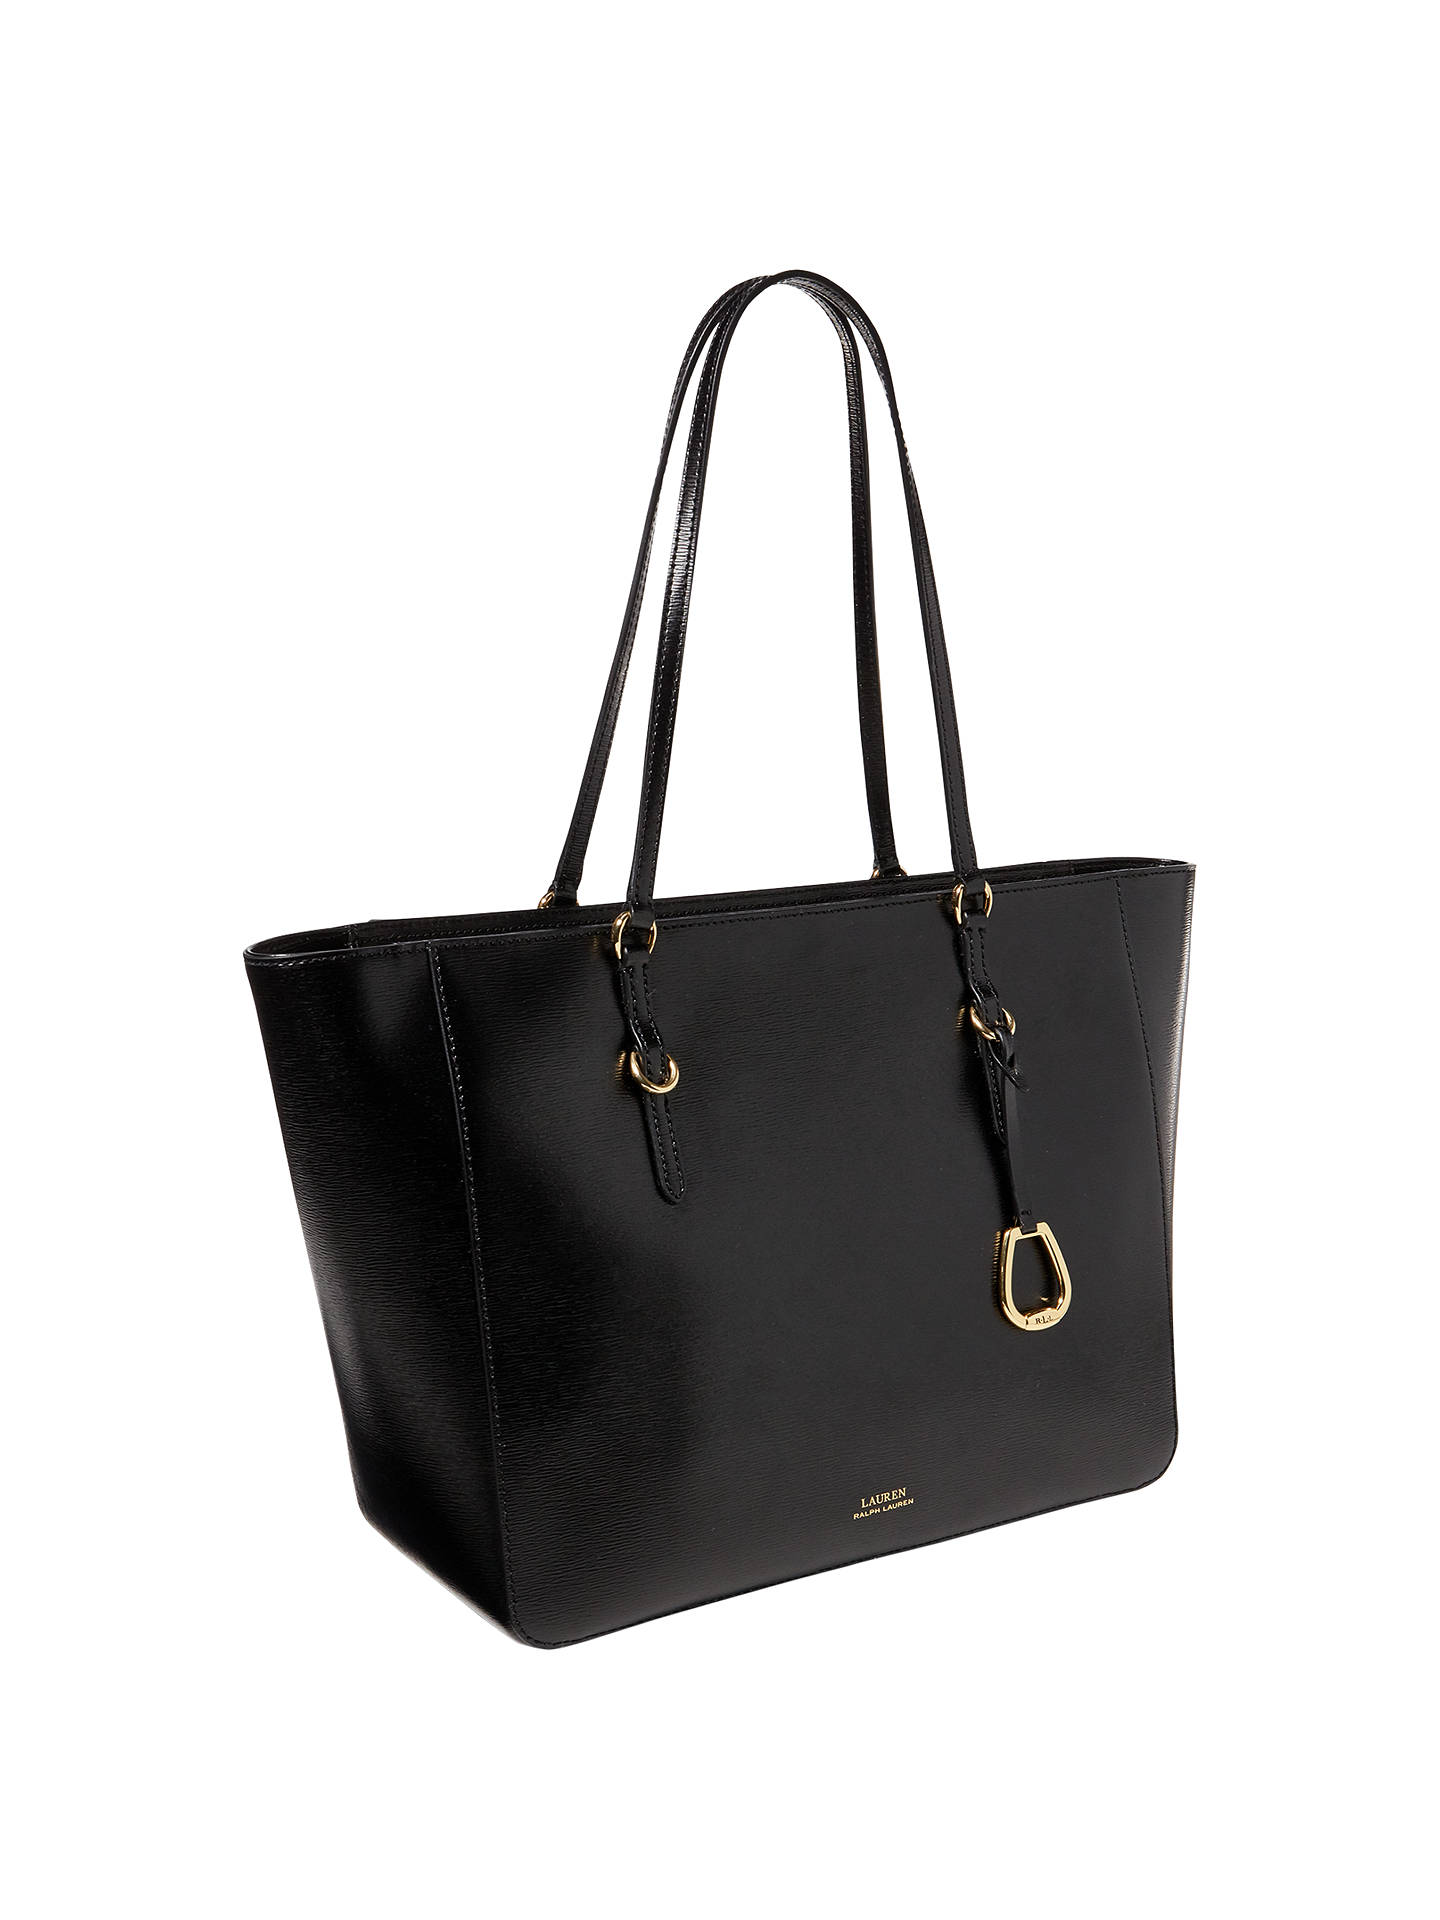 4f58e8bcf2 ... ebay buylauren ralph lauren saffiano leather tote bag black online at  johnlewis c7894 196c0